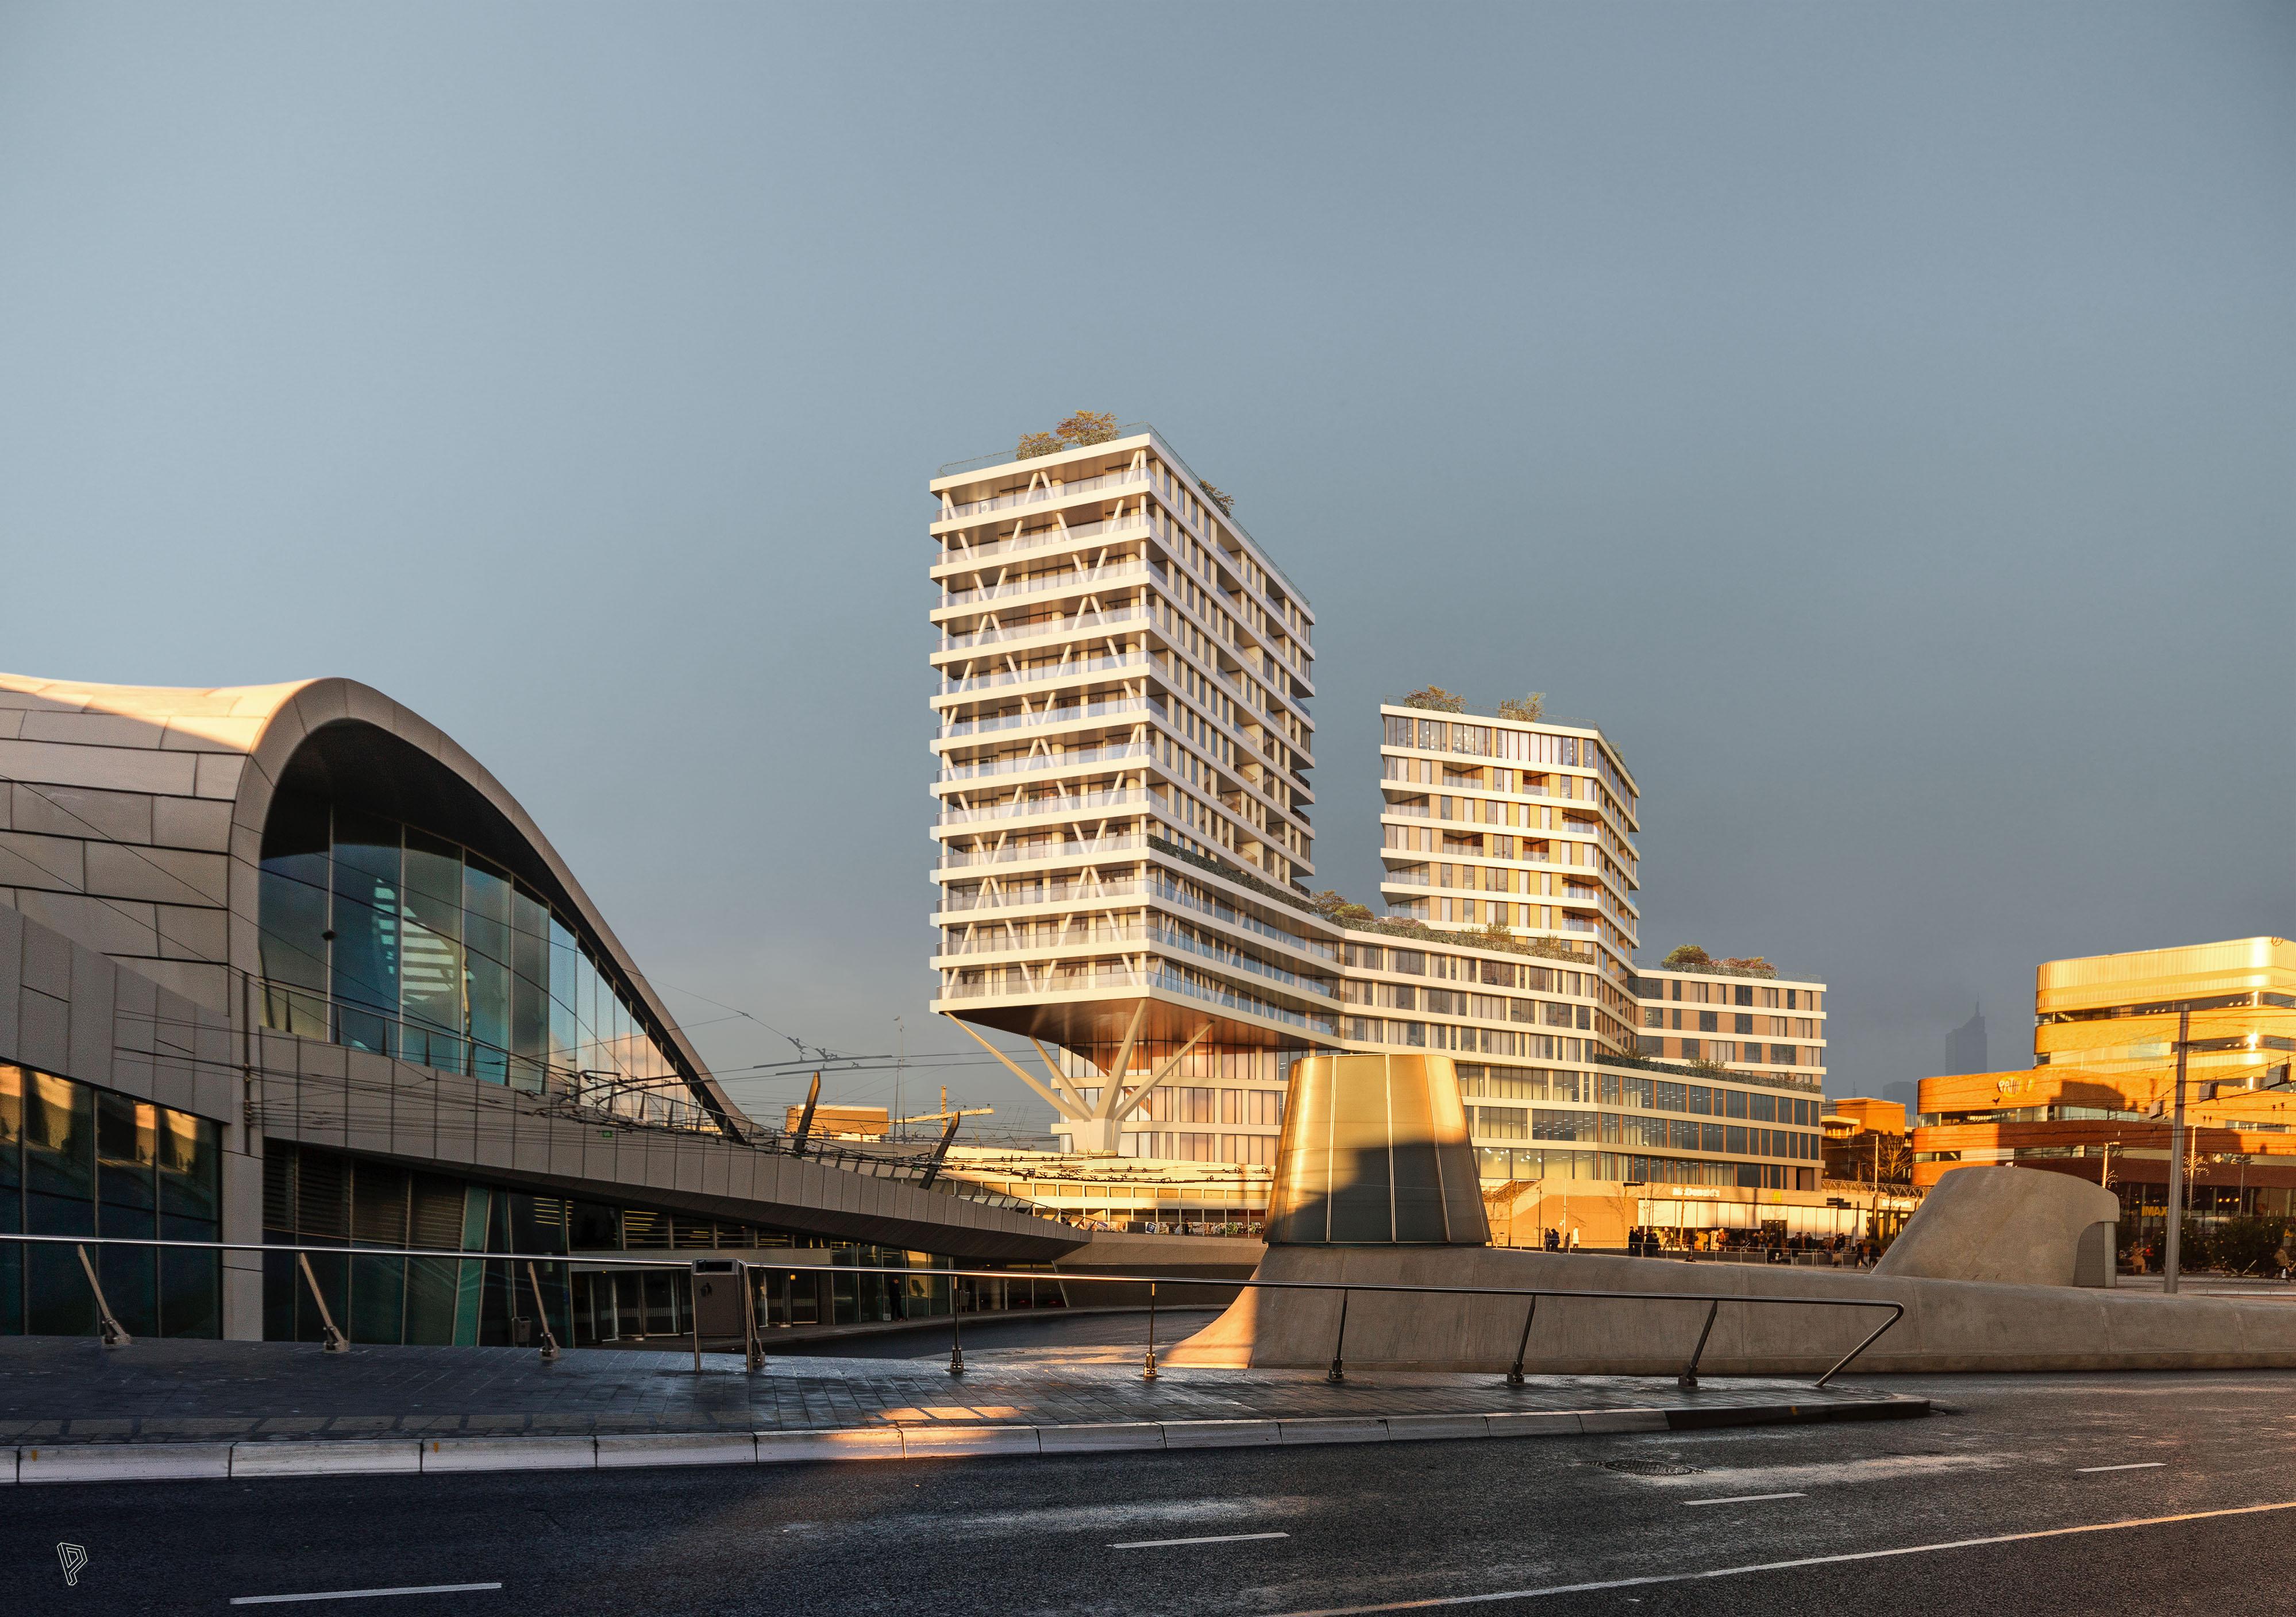 <p>Morning gold, Paul de Ruiter Architects, Arnhem</p>